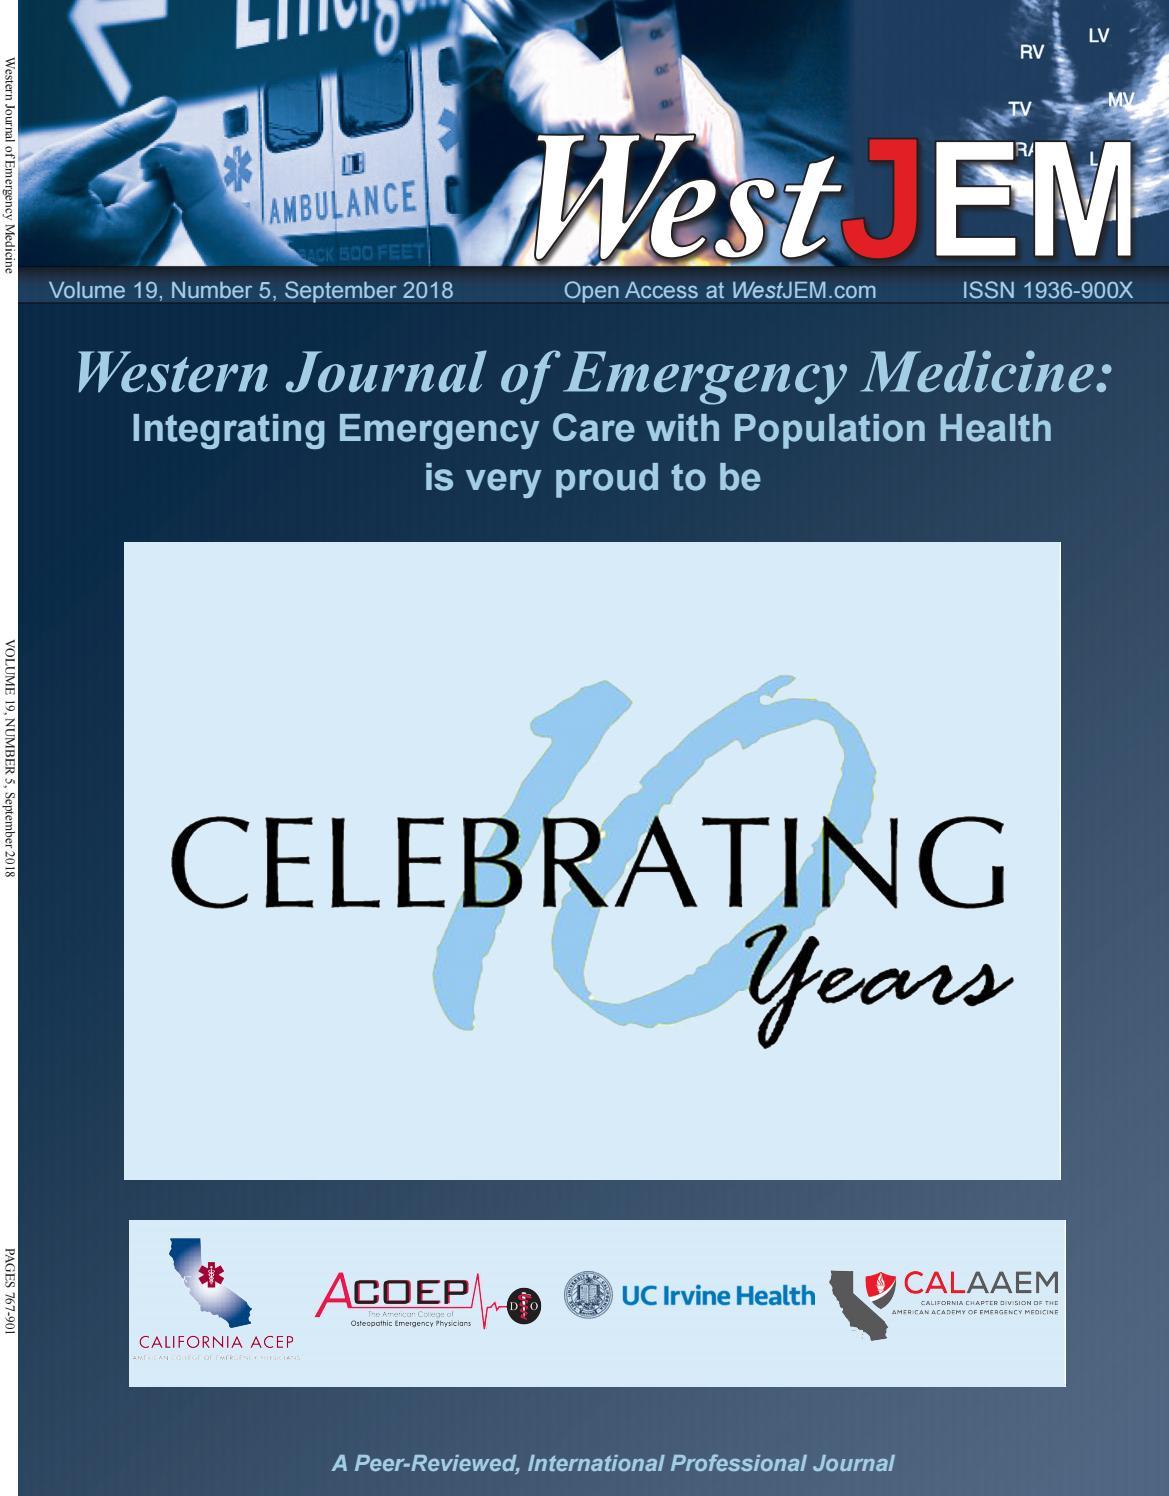 Volume 19 Issue 5 By Western Journal Of Emergency Medicine Issuu E Voucher 7 Eleven 711 Rp 10000